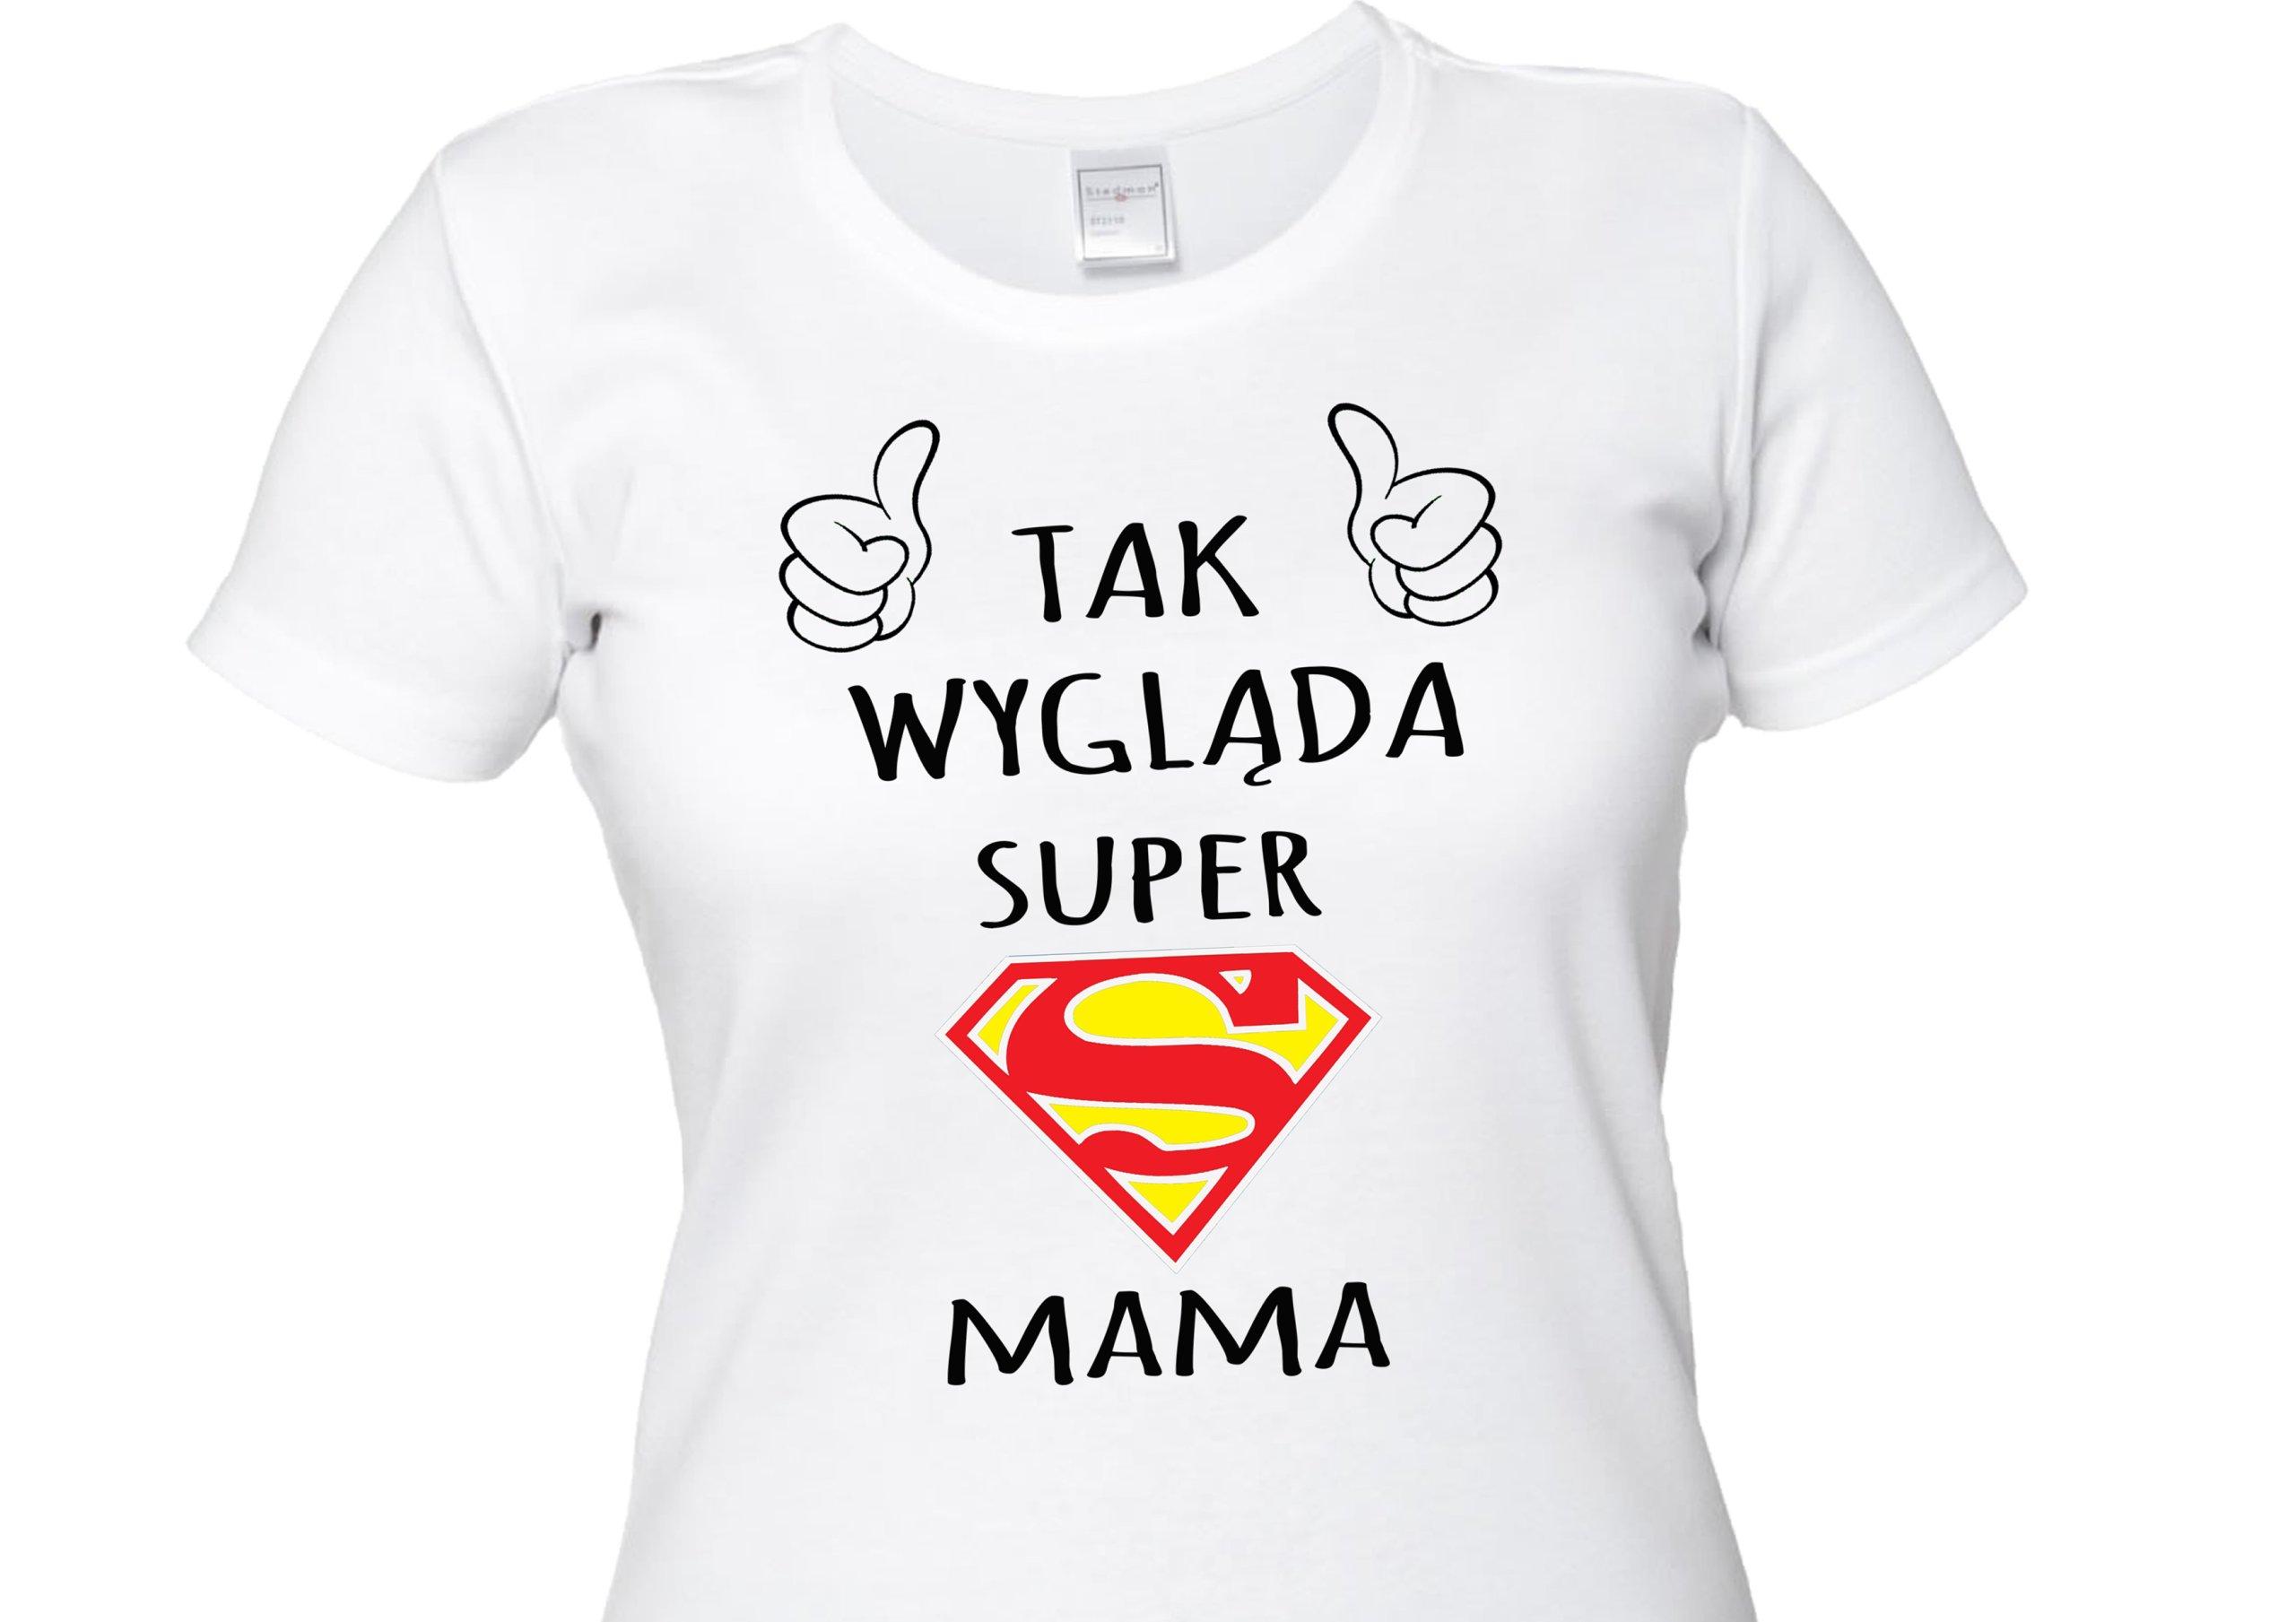 09ef4bc2d610d1 Koszulka na DZIEŃ MATKI mamy t-shirt dużo wzorów - 7326743778 ...